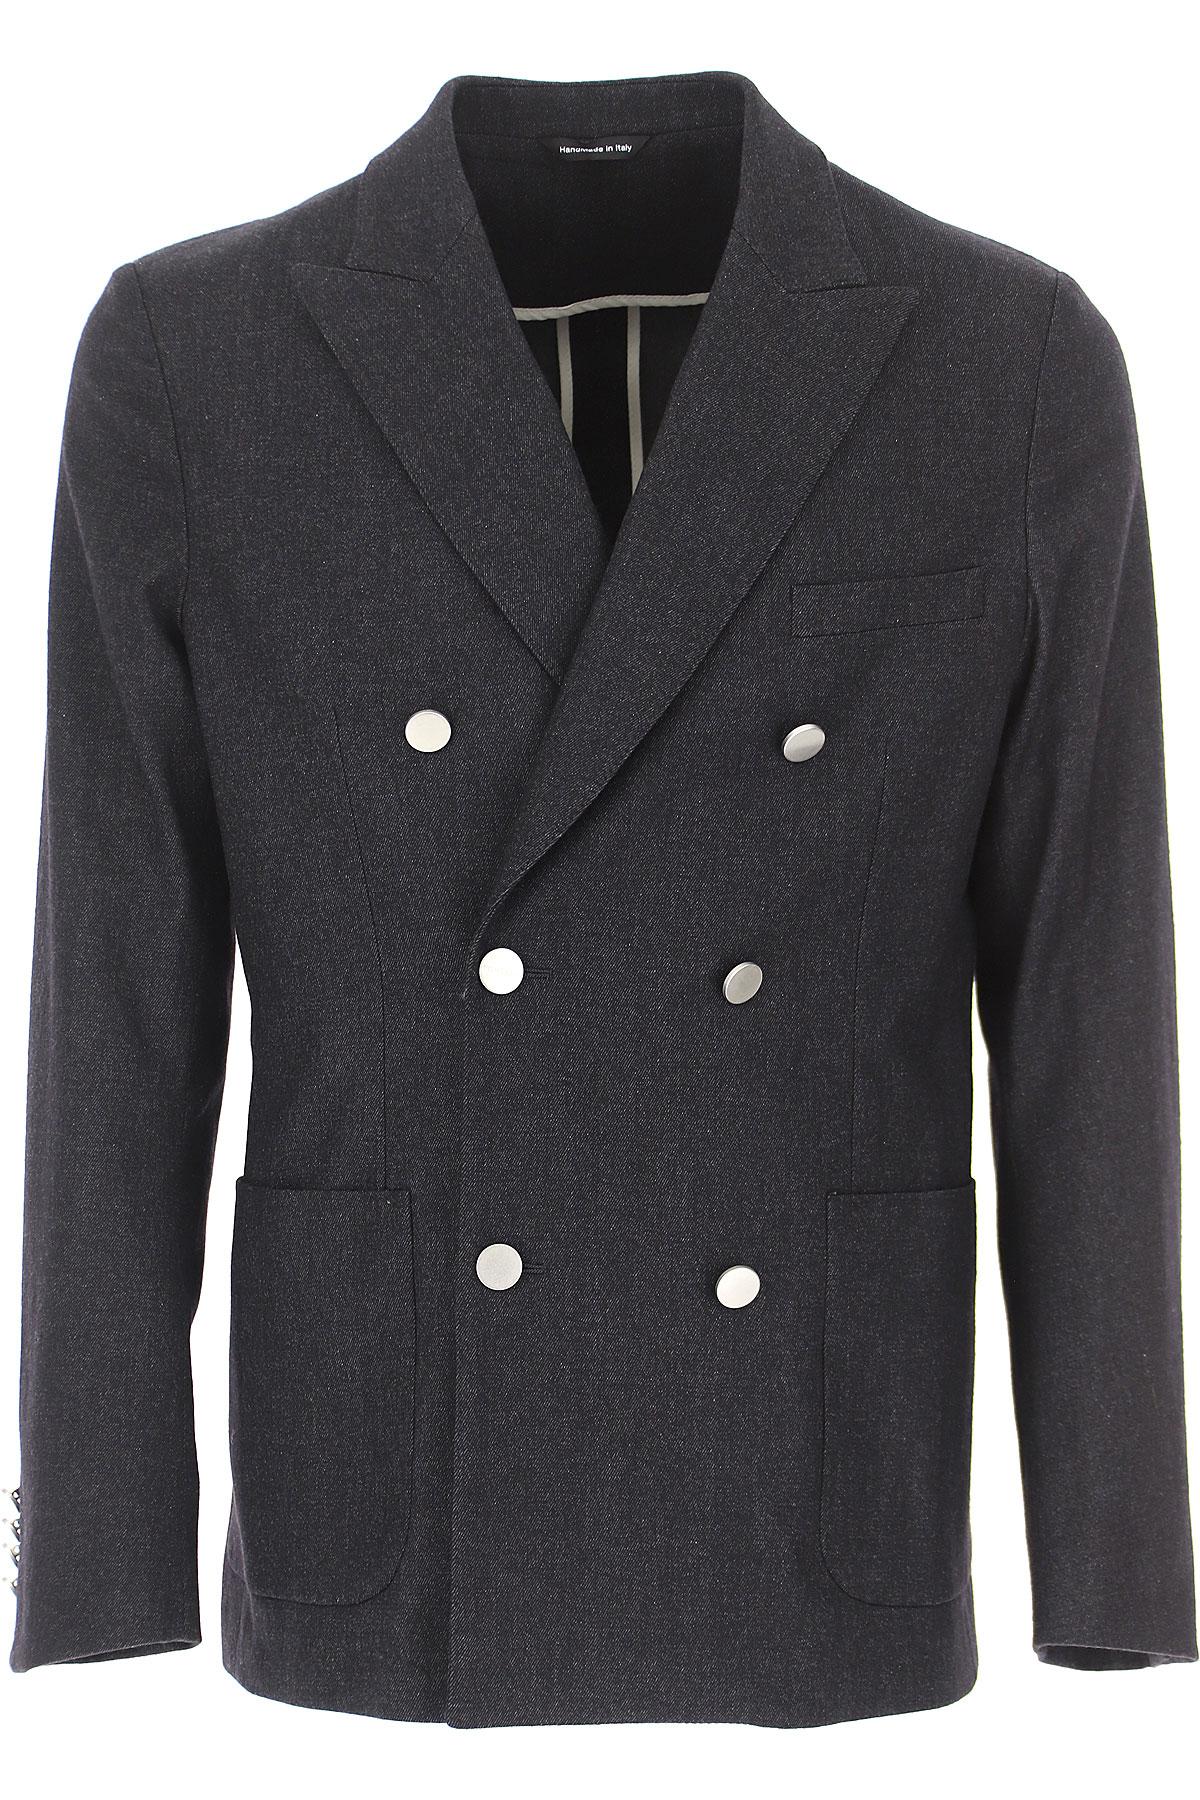 Tonello Blazer for Men, Sport Coat On Sale, Anthracite Grey Melange, Virgin wool, 2019, L XXL